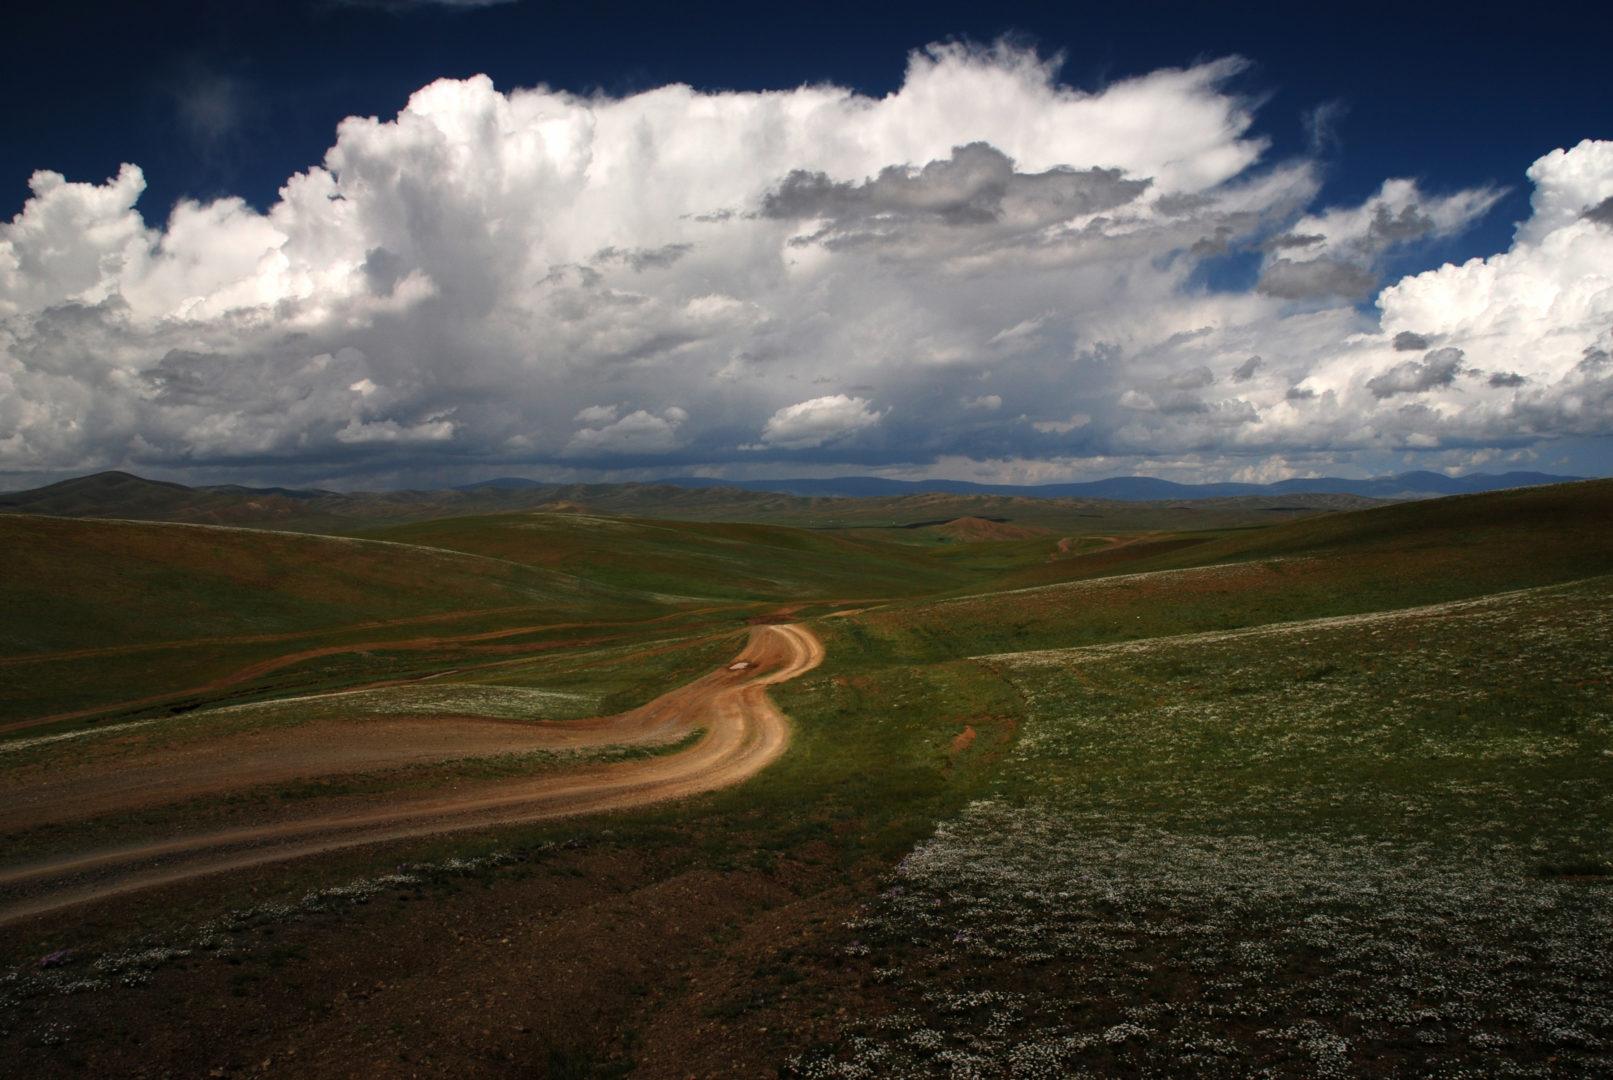 Endlose Steppe, vereint mit dem Himmel